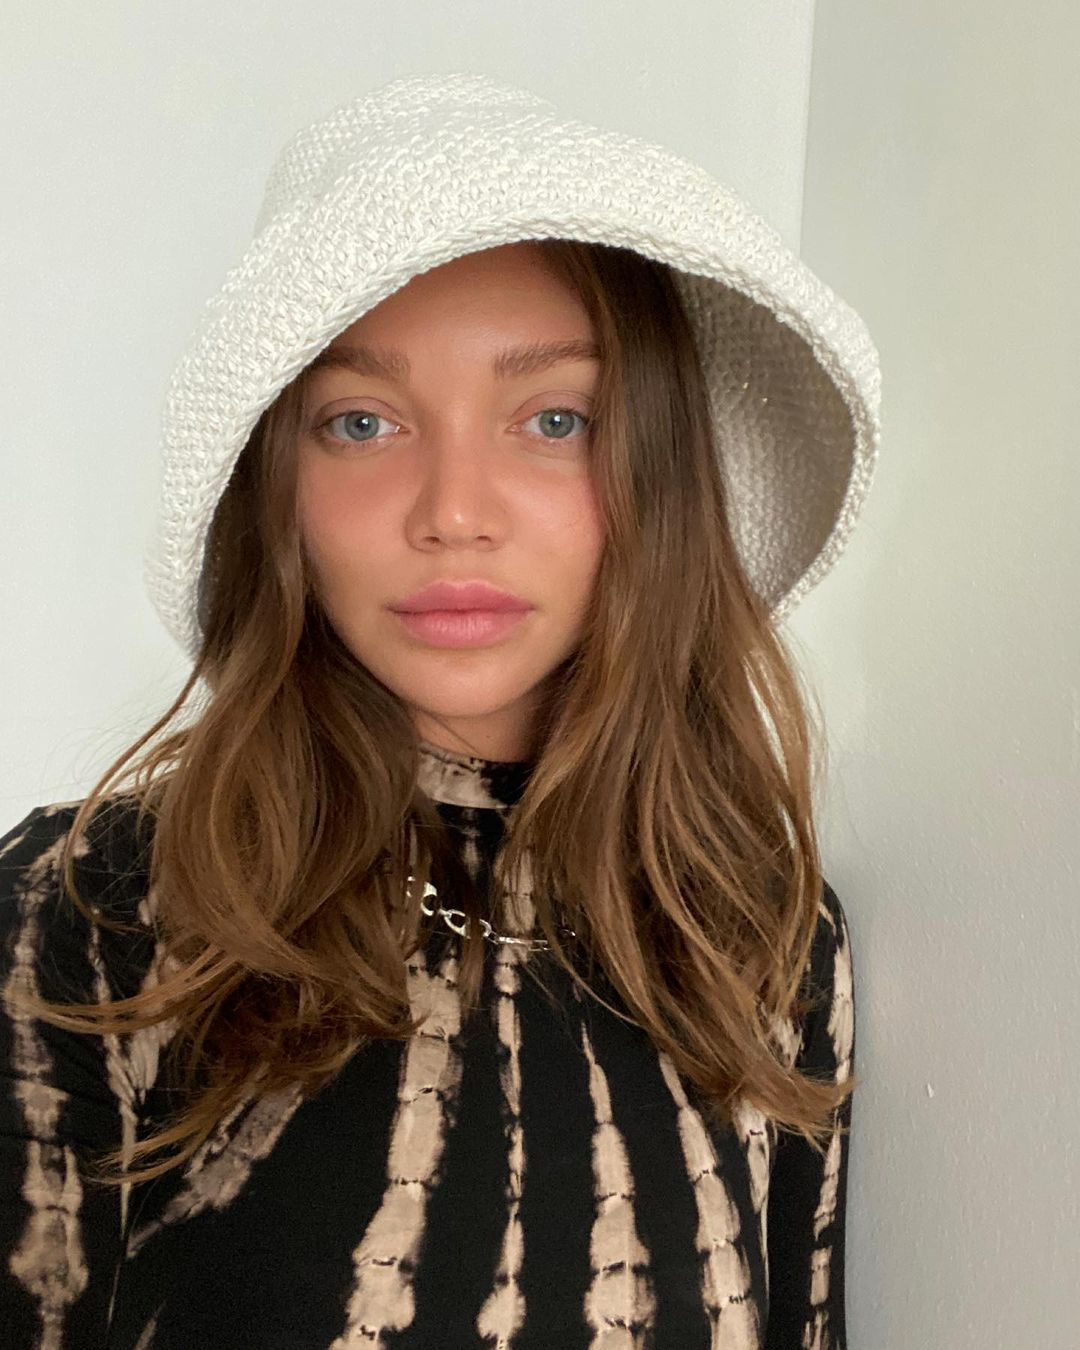 Jessie-Andrews-Wallpapers-Insta-Fit-Bio-6